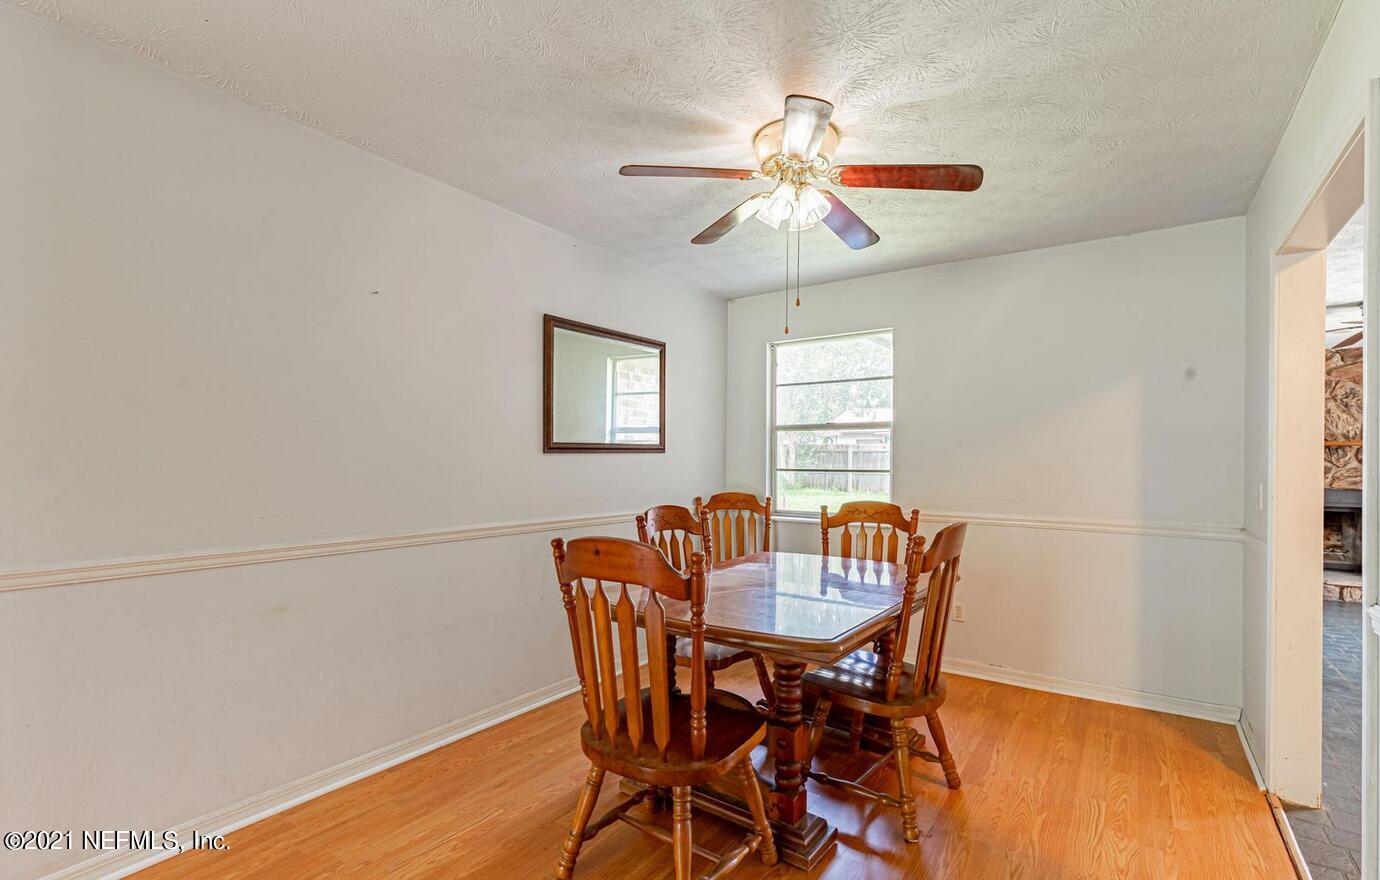 2184 GEORGE WYTHE, ORANGE PARK, FLORIDA 32073, 3 Bedrooms Bedrooms, ,2 BathroomsBathrooms,Residential,For sale,GEORGE WYTHE,1132360